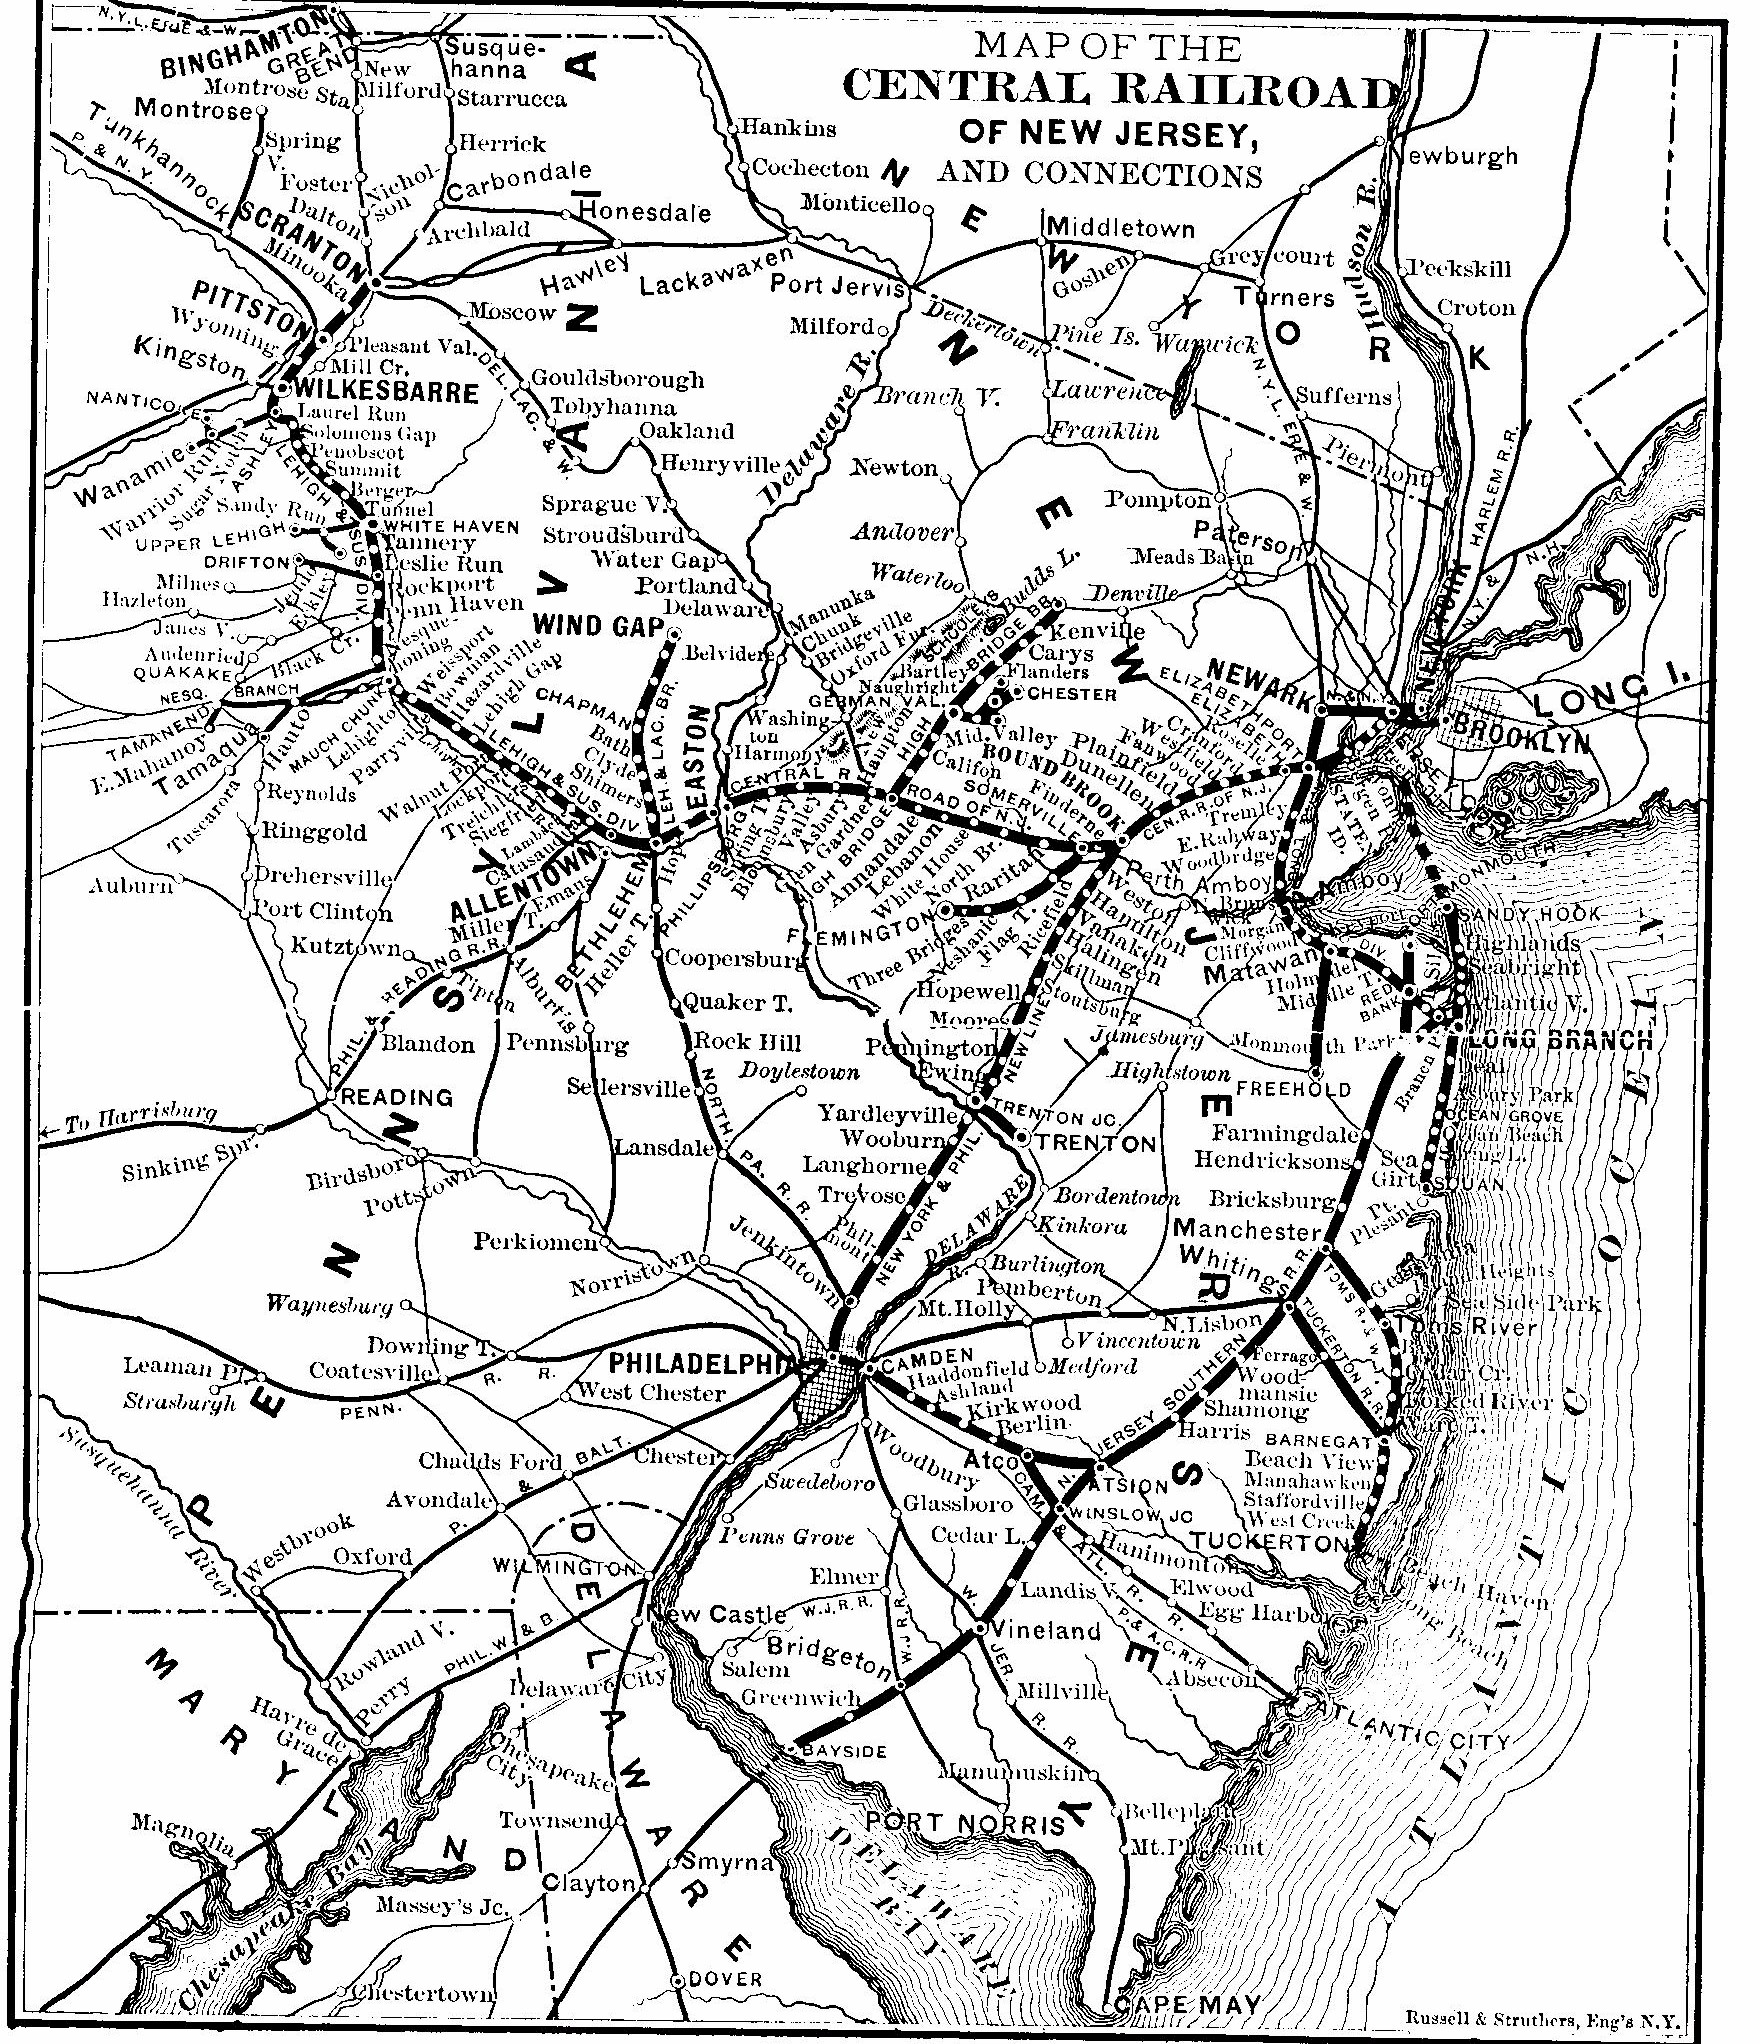 The Jersey Central through Roselle, Roselle Park, Aldene, and Cranford